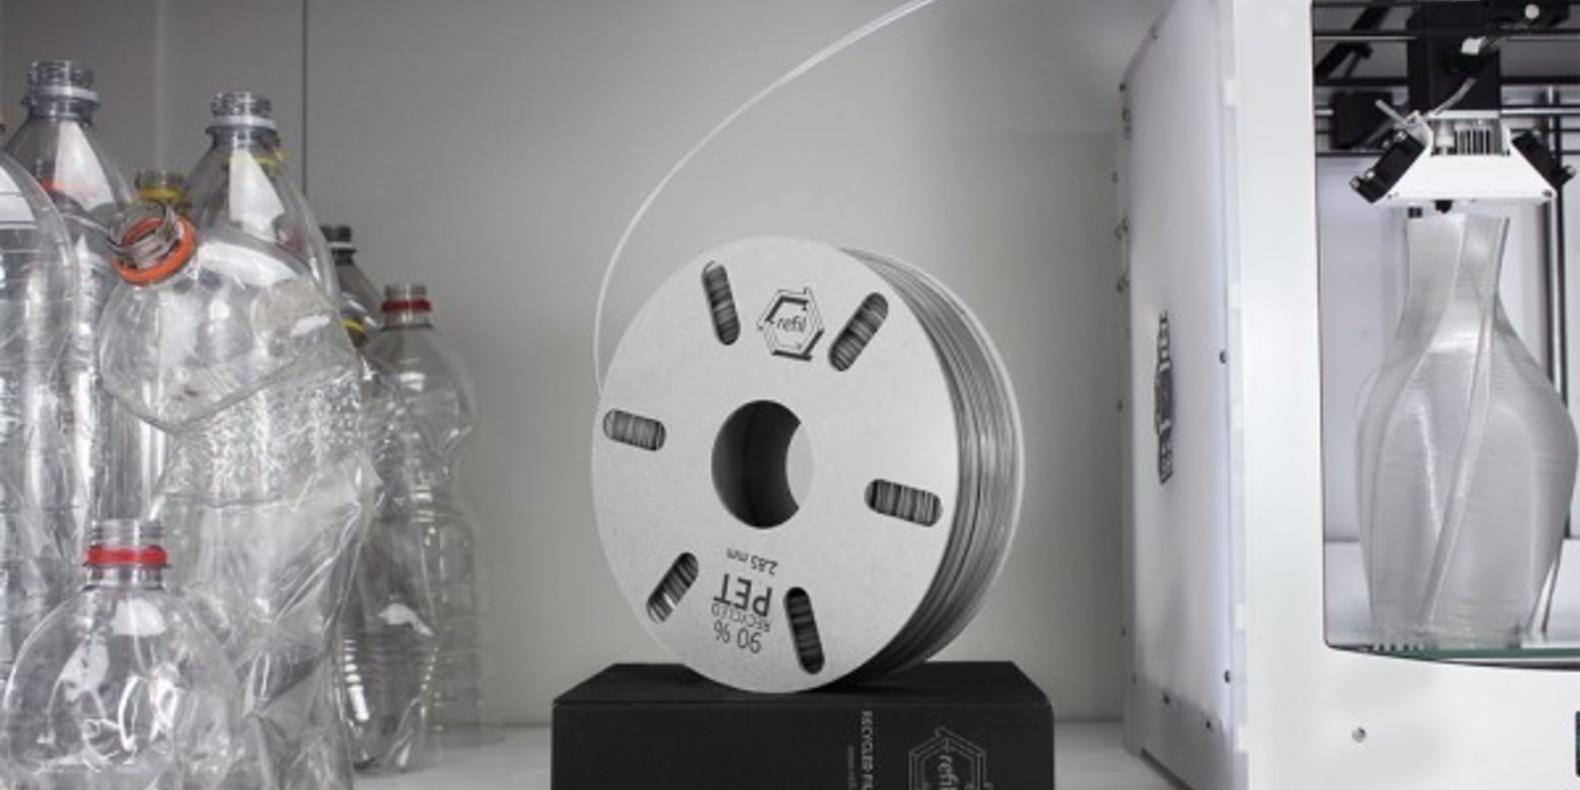 http://fichier3d.fr/wp-content/uploads/2016/06/Code-promo-promotion-refil-re-filament-cults-voucher-cheap-recycled-abs.jpg